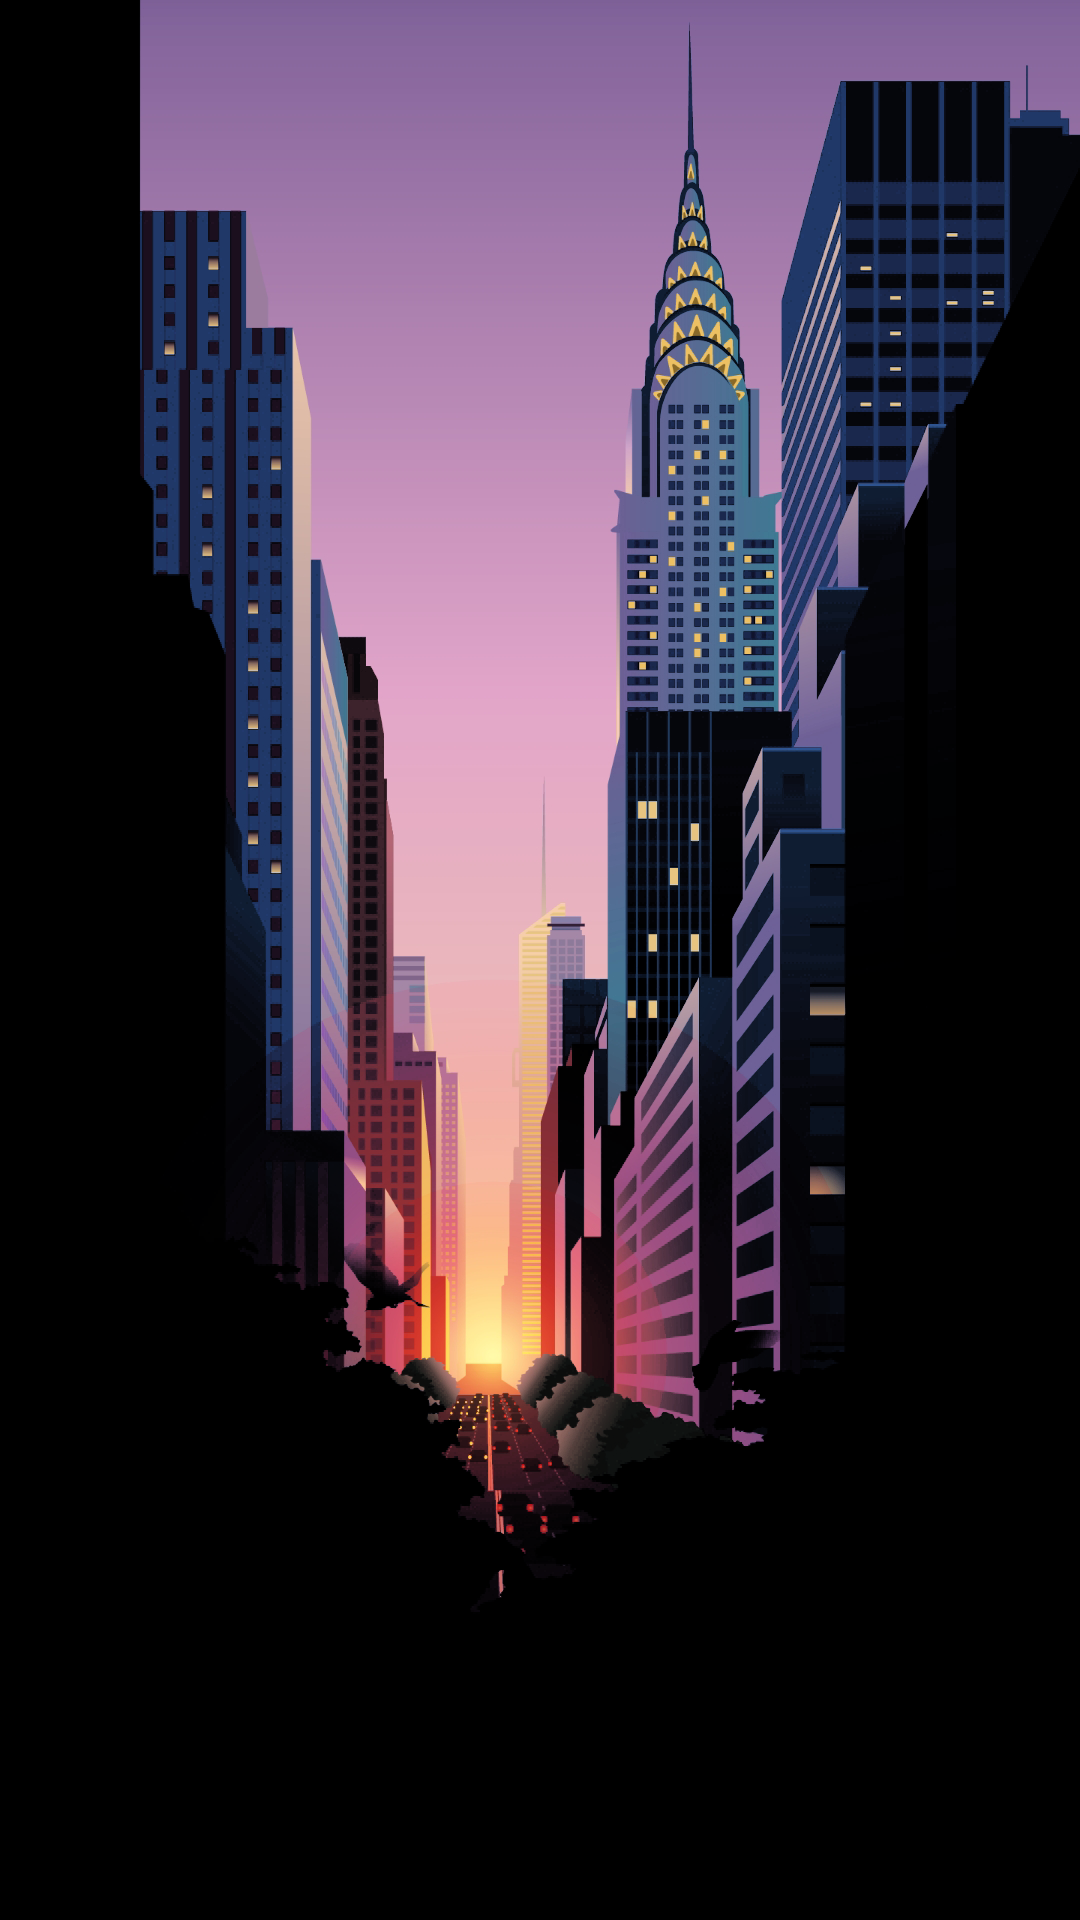 Cityscape City Metropolitan Area Skyscraper Metropolis Skyline Iphone Wallpaper New York Iphone Wallpaper Scenery Wallpaper Graphic Wallpaper